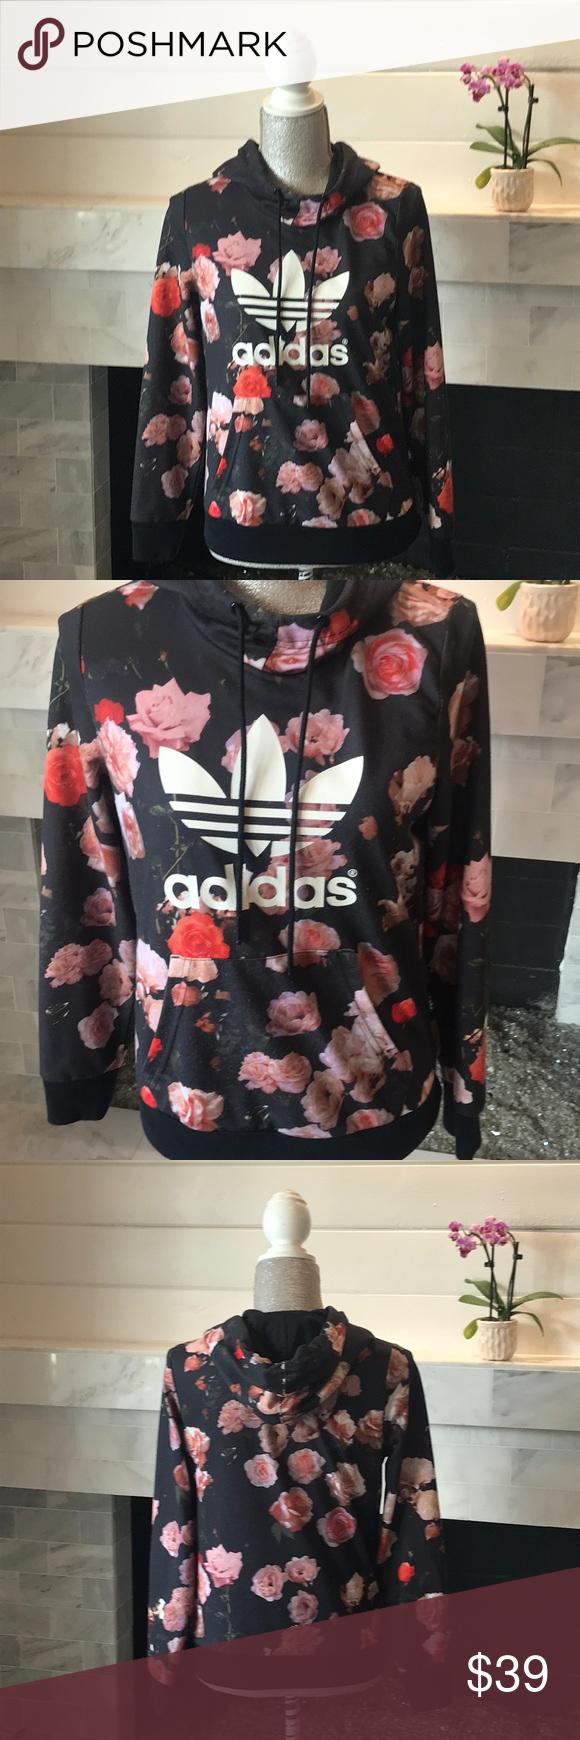 Adidas Floral Print Logo Hooded Sweatshirt Euc Adidas Floral Clothes Design Fashion [ 1740 x 580 Pixel ]